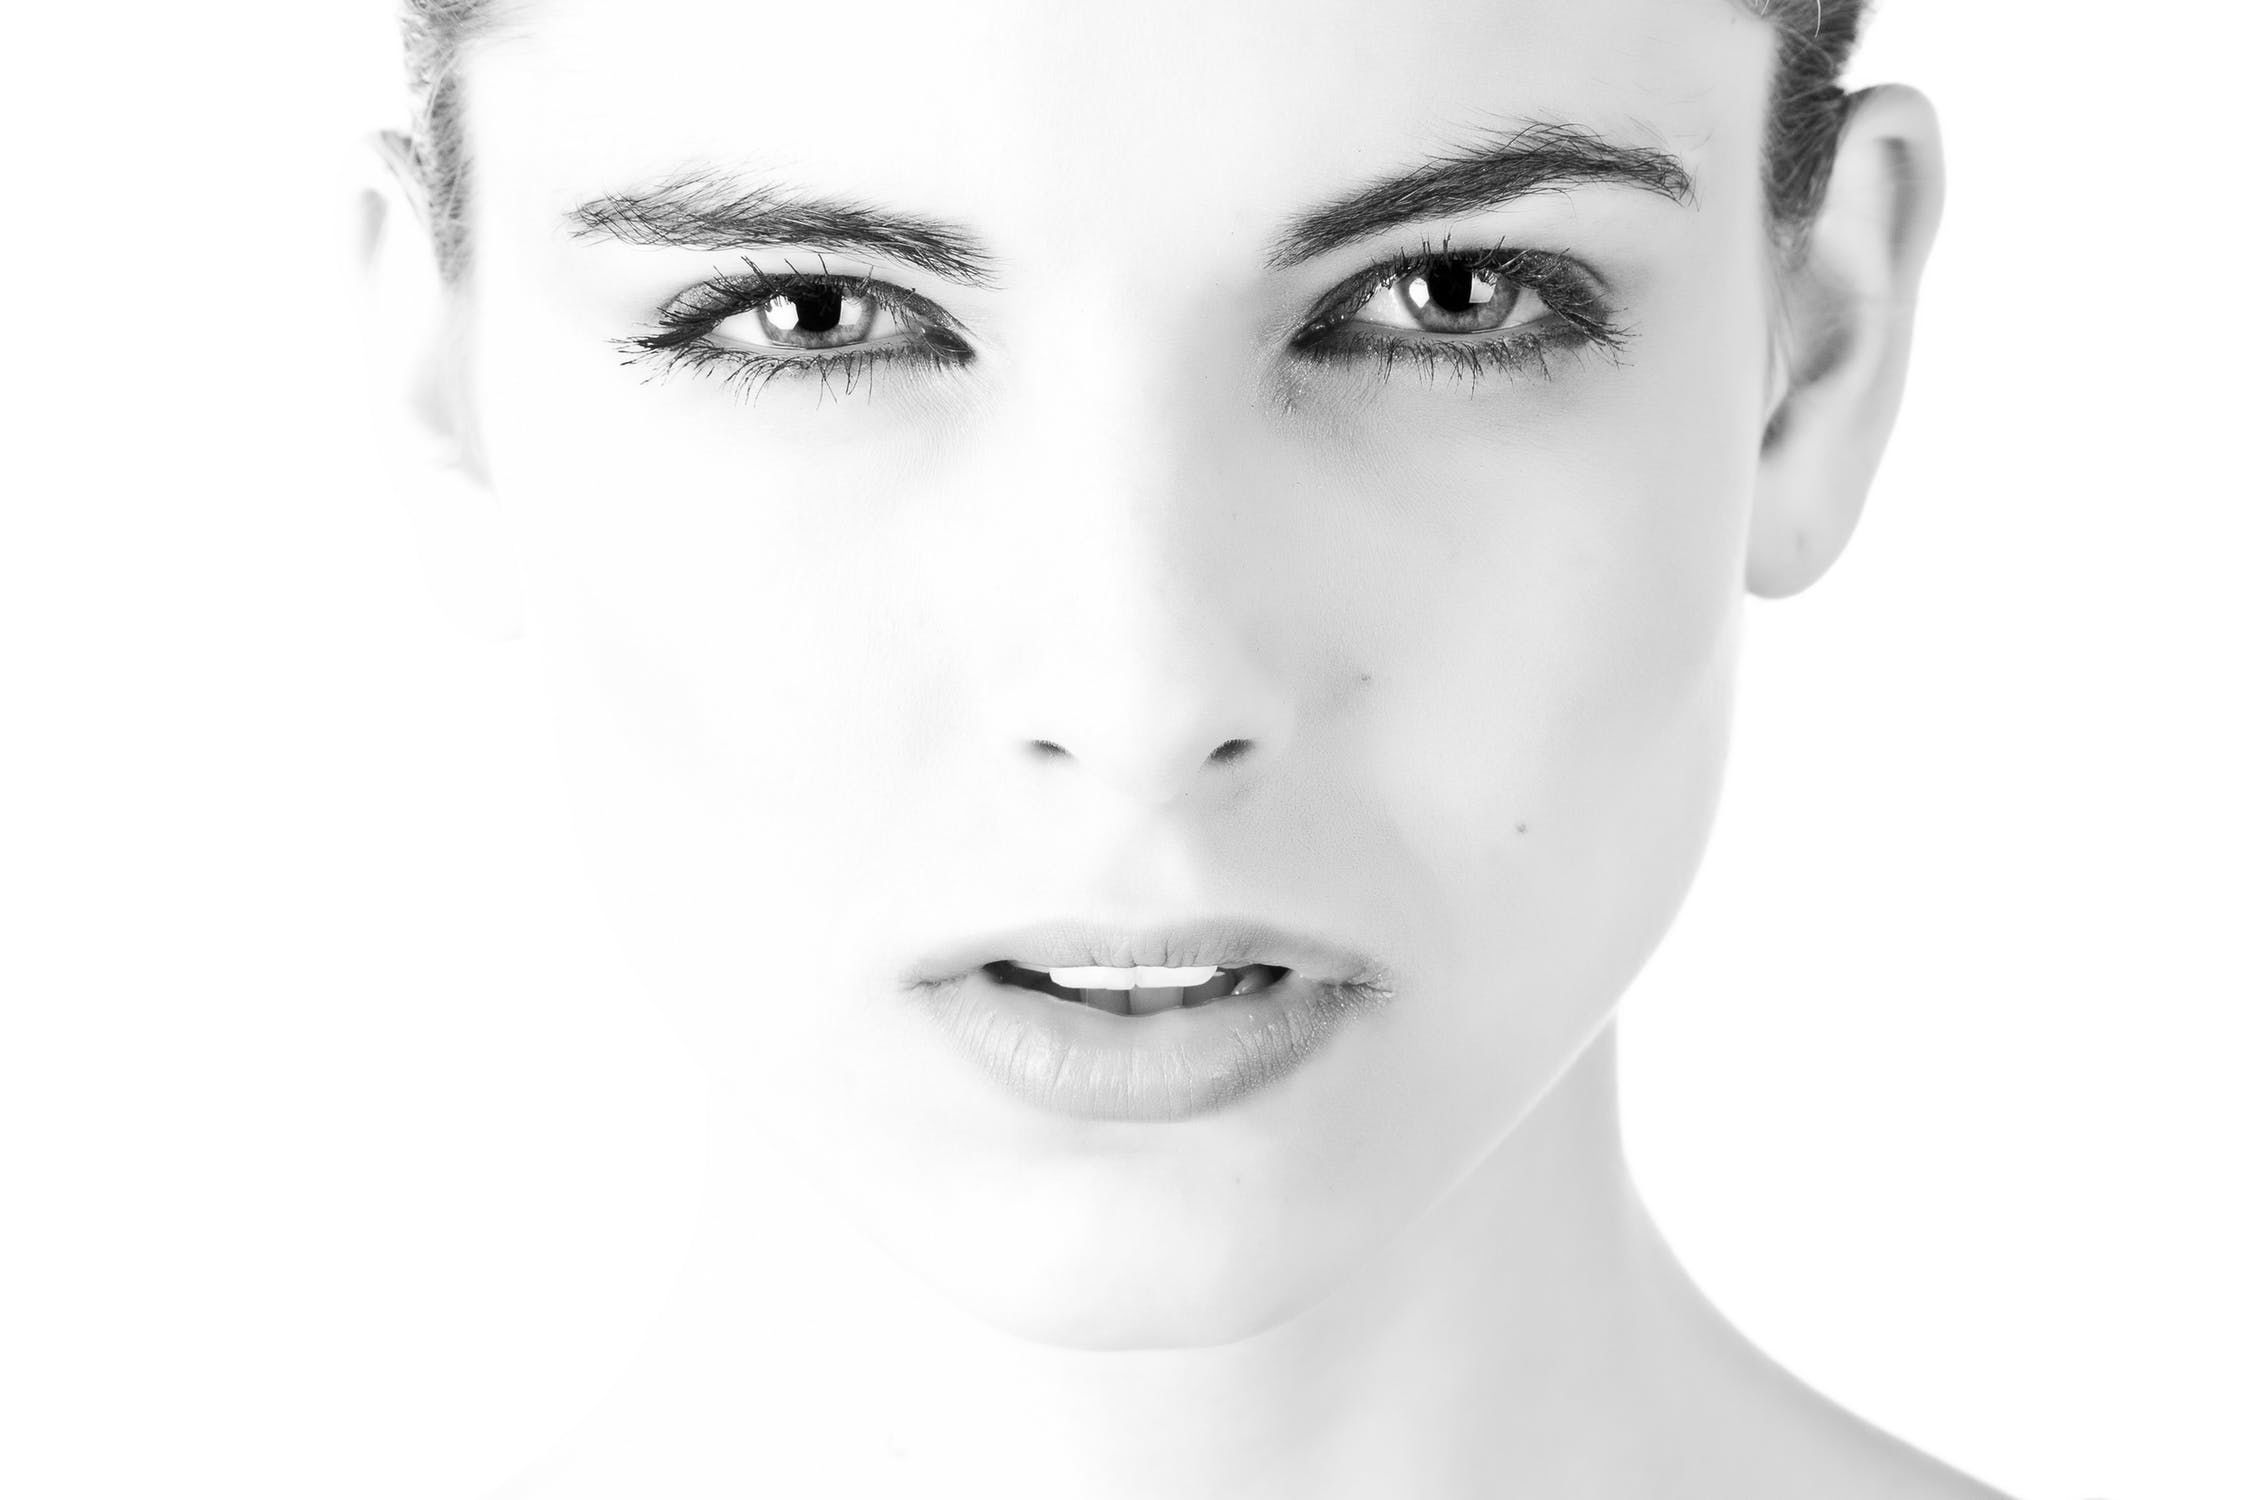 model-face-beautiful-black-and-white-407035.jpe